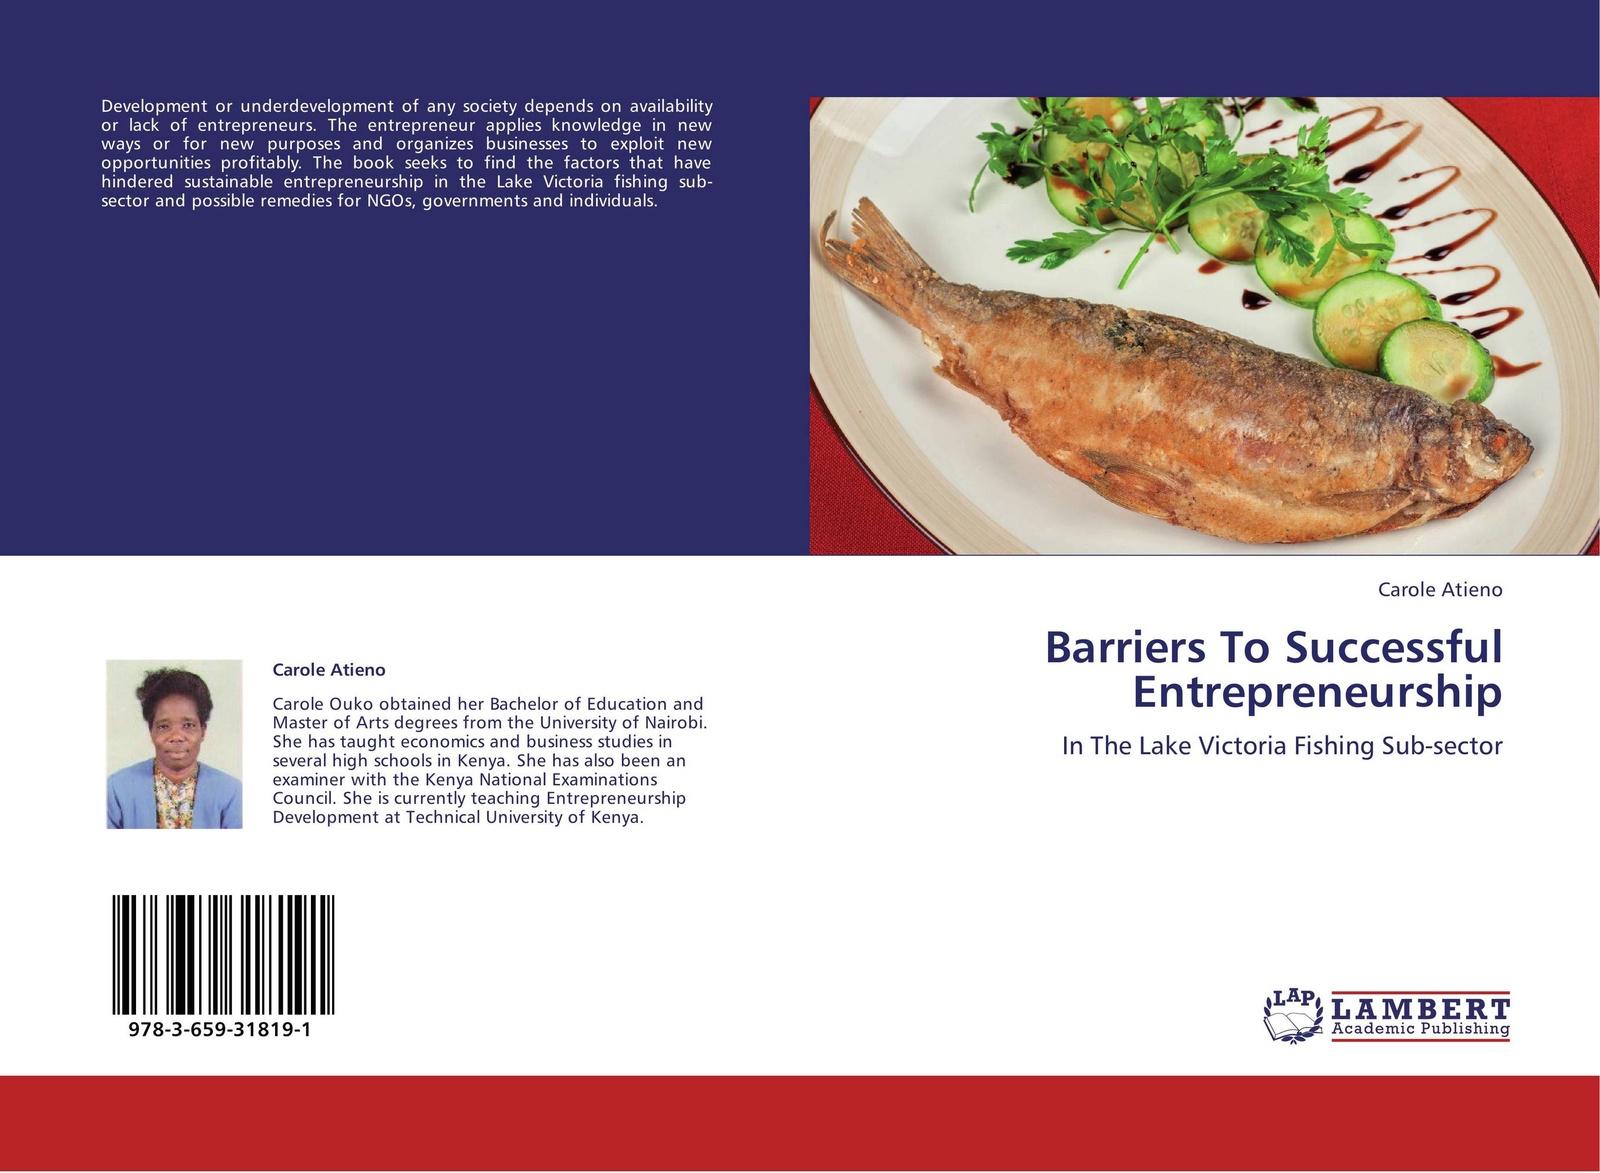 Carole Atieno Barriers To Successful Entrepreneurship paul opondo fishing policy in colonial kenya lake victoria 1880 1978